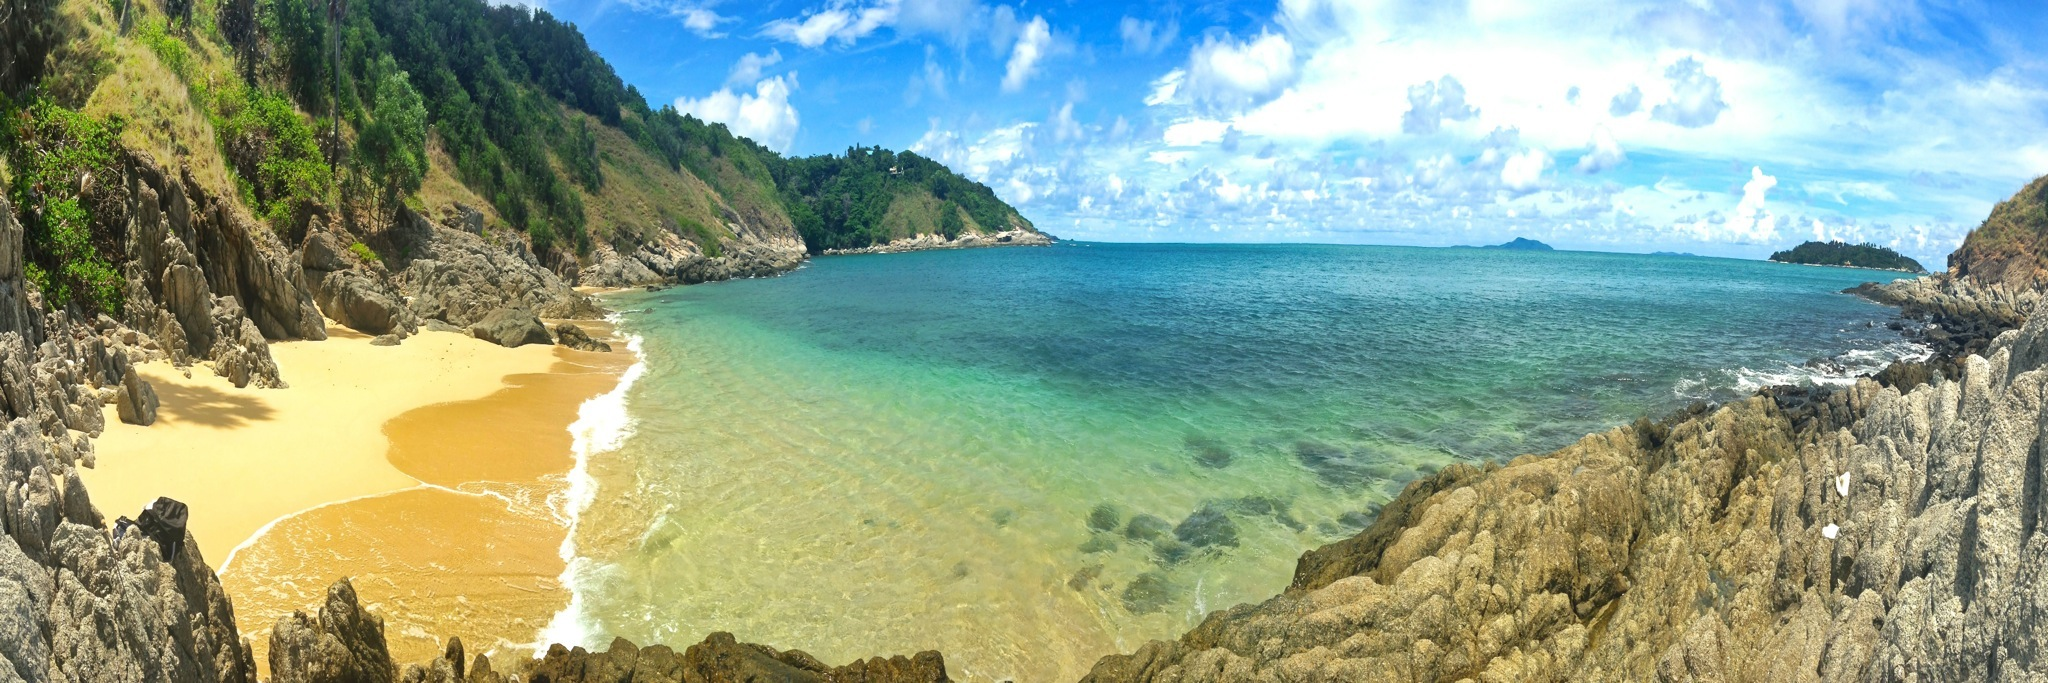 vacanze-in-thailandia